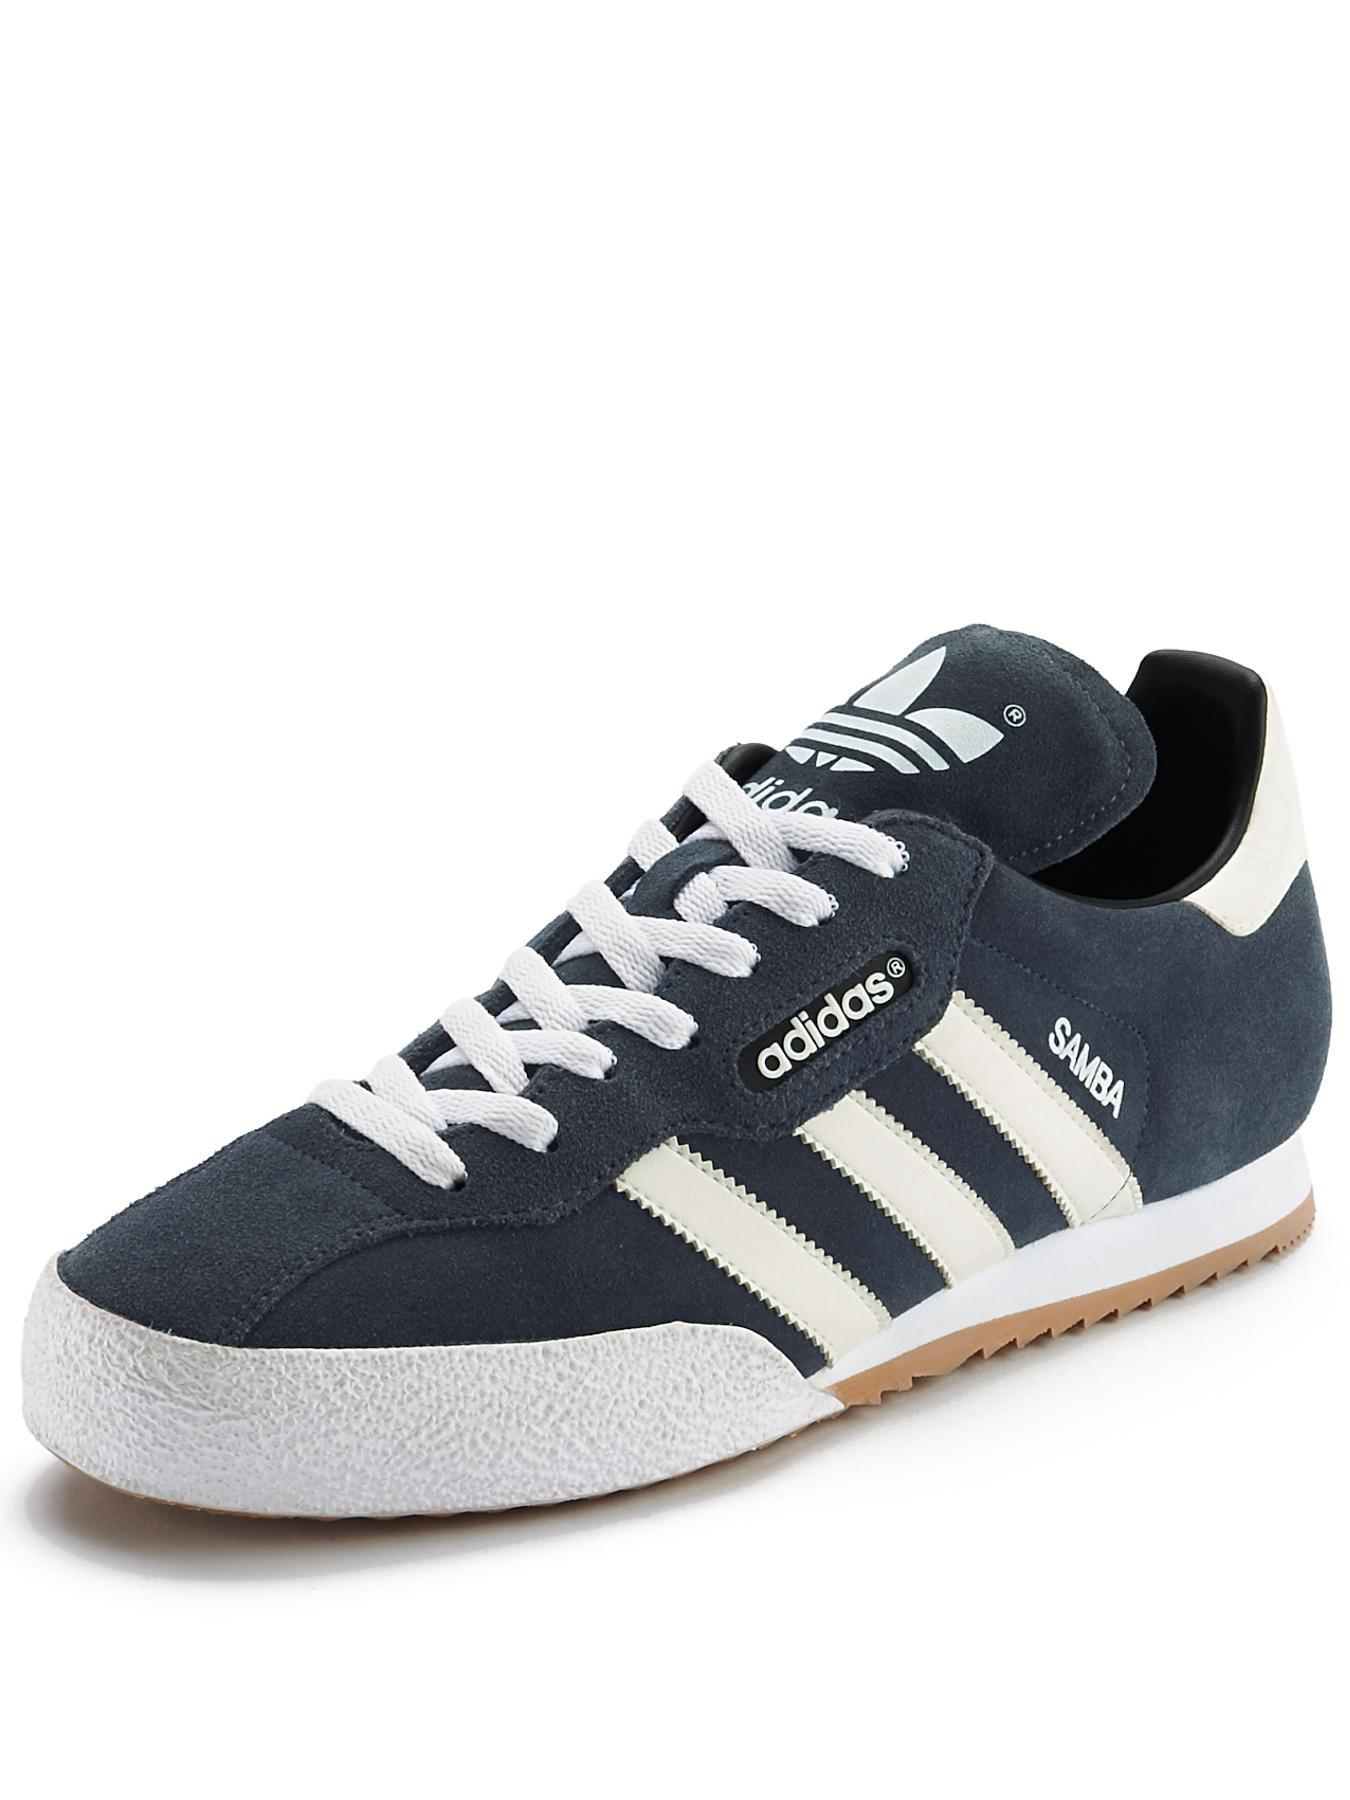 e5b75403f04 ... canada adidas originals samba super suede trainers c60c9 75cab